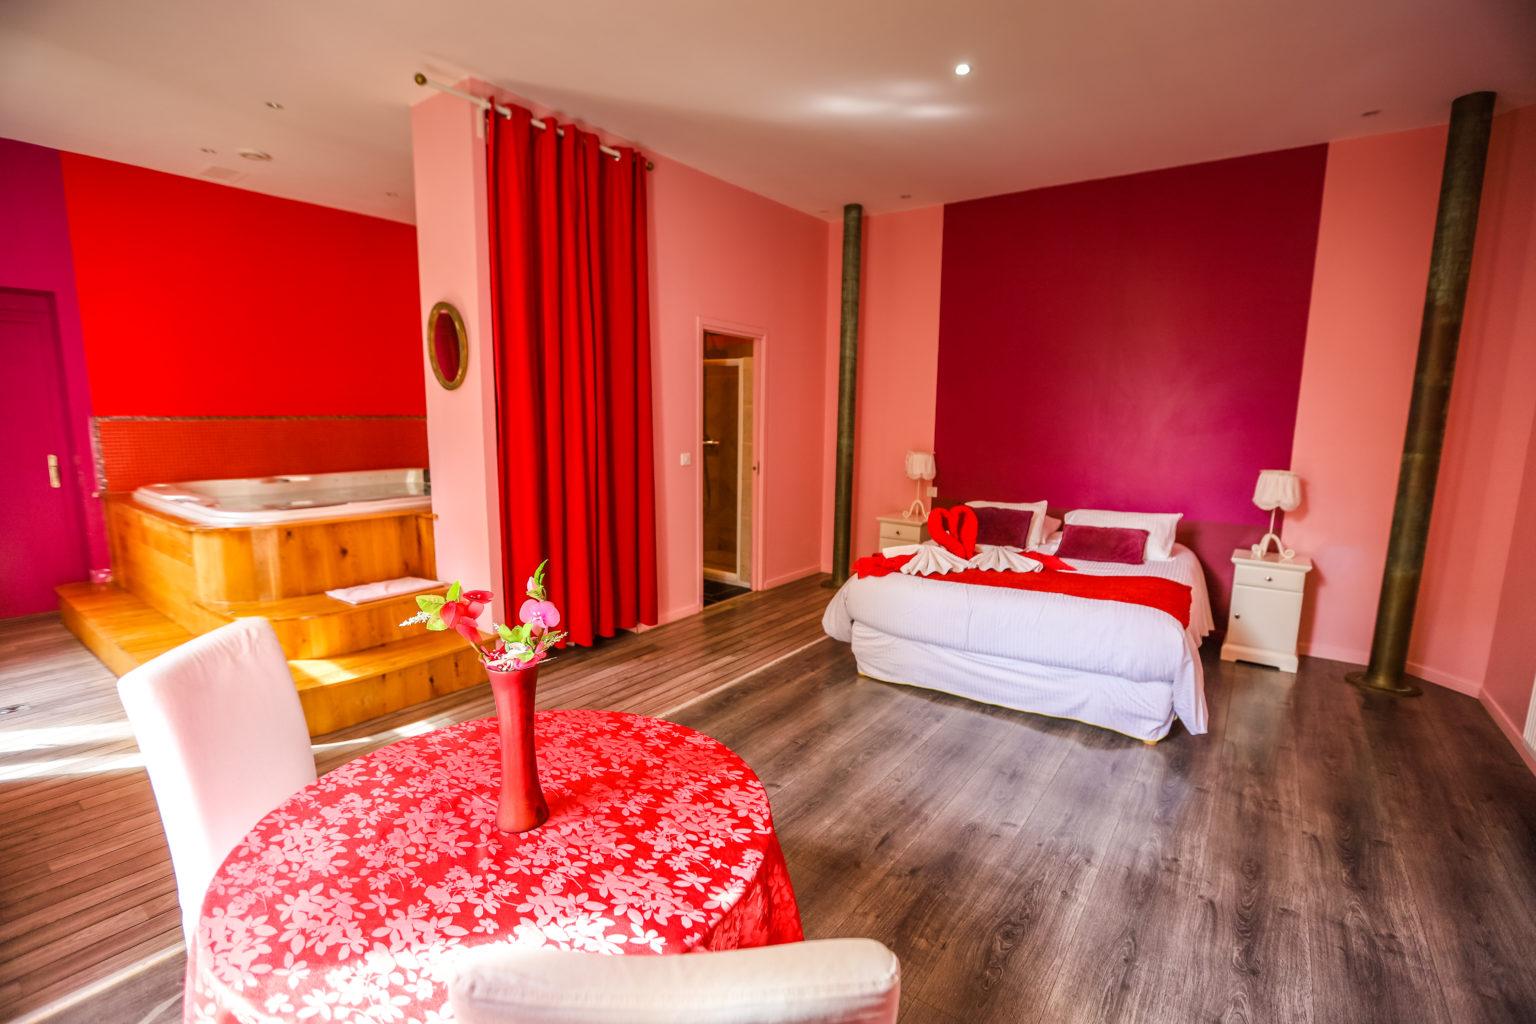 CHAMBRE LA FONTVINEUSE IMG_1634LA FONT VINEUSE HOTEL & SPA